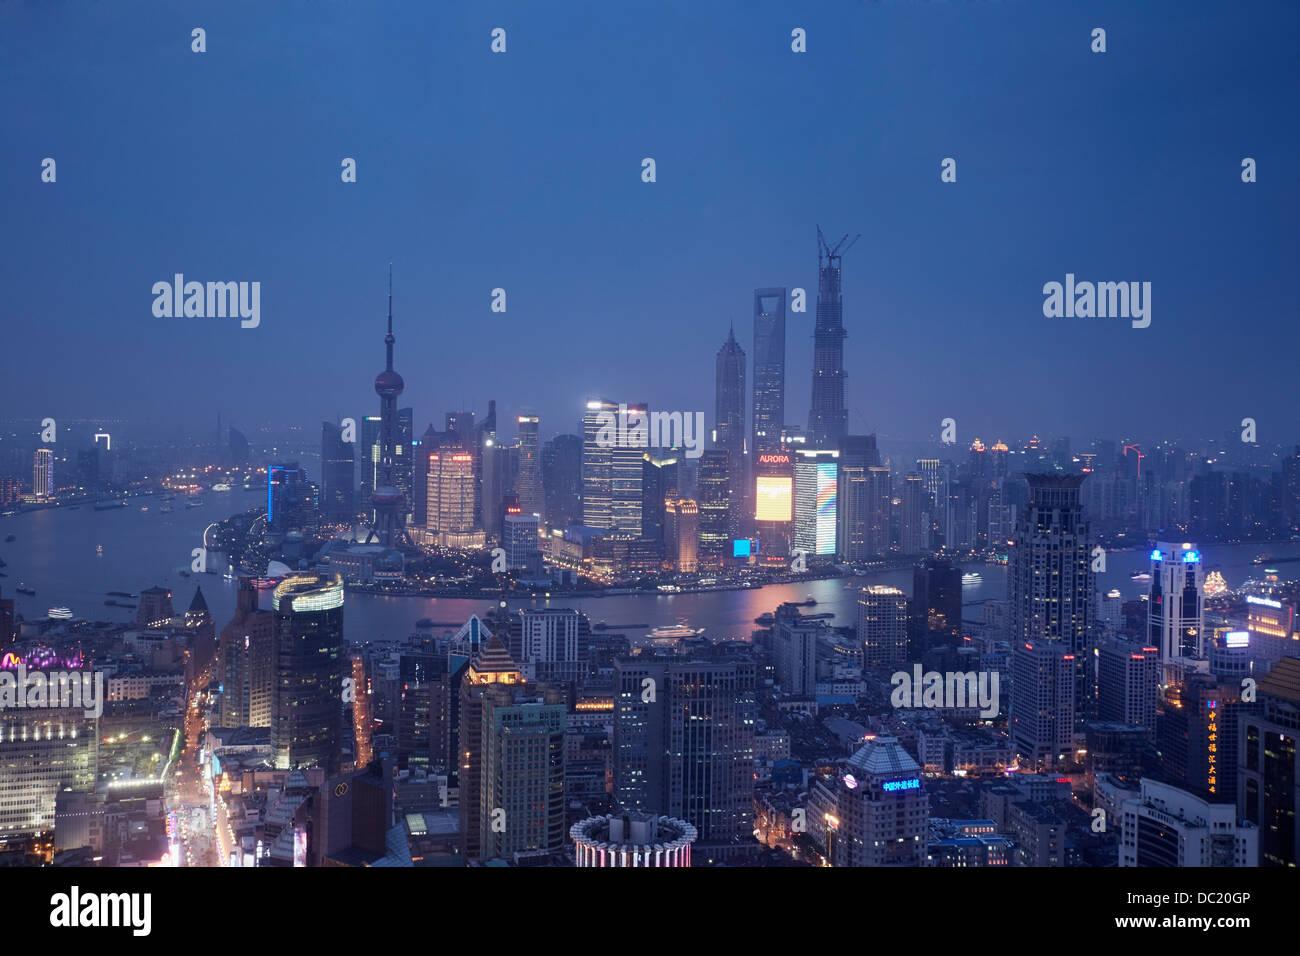 Paesaggio di Shanghai di notte, Cina Immagini Stock